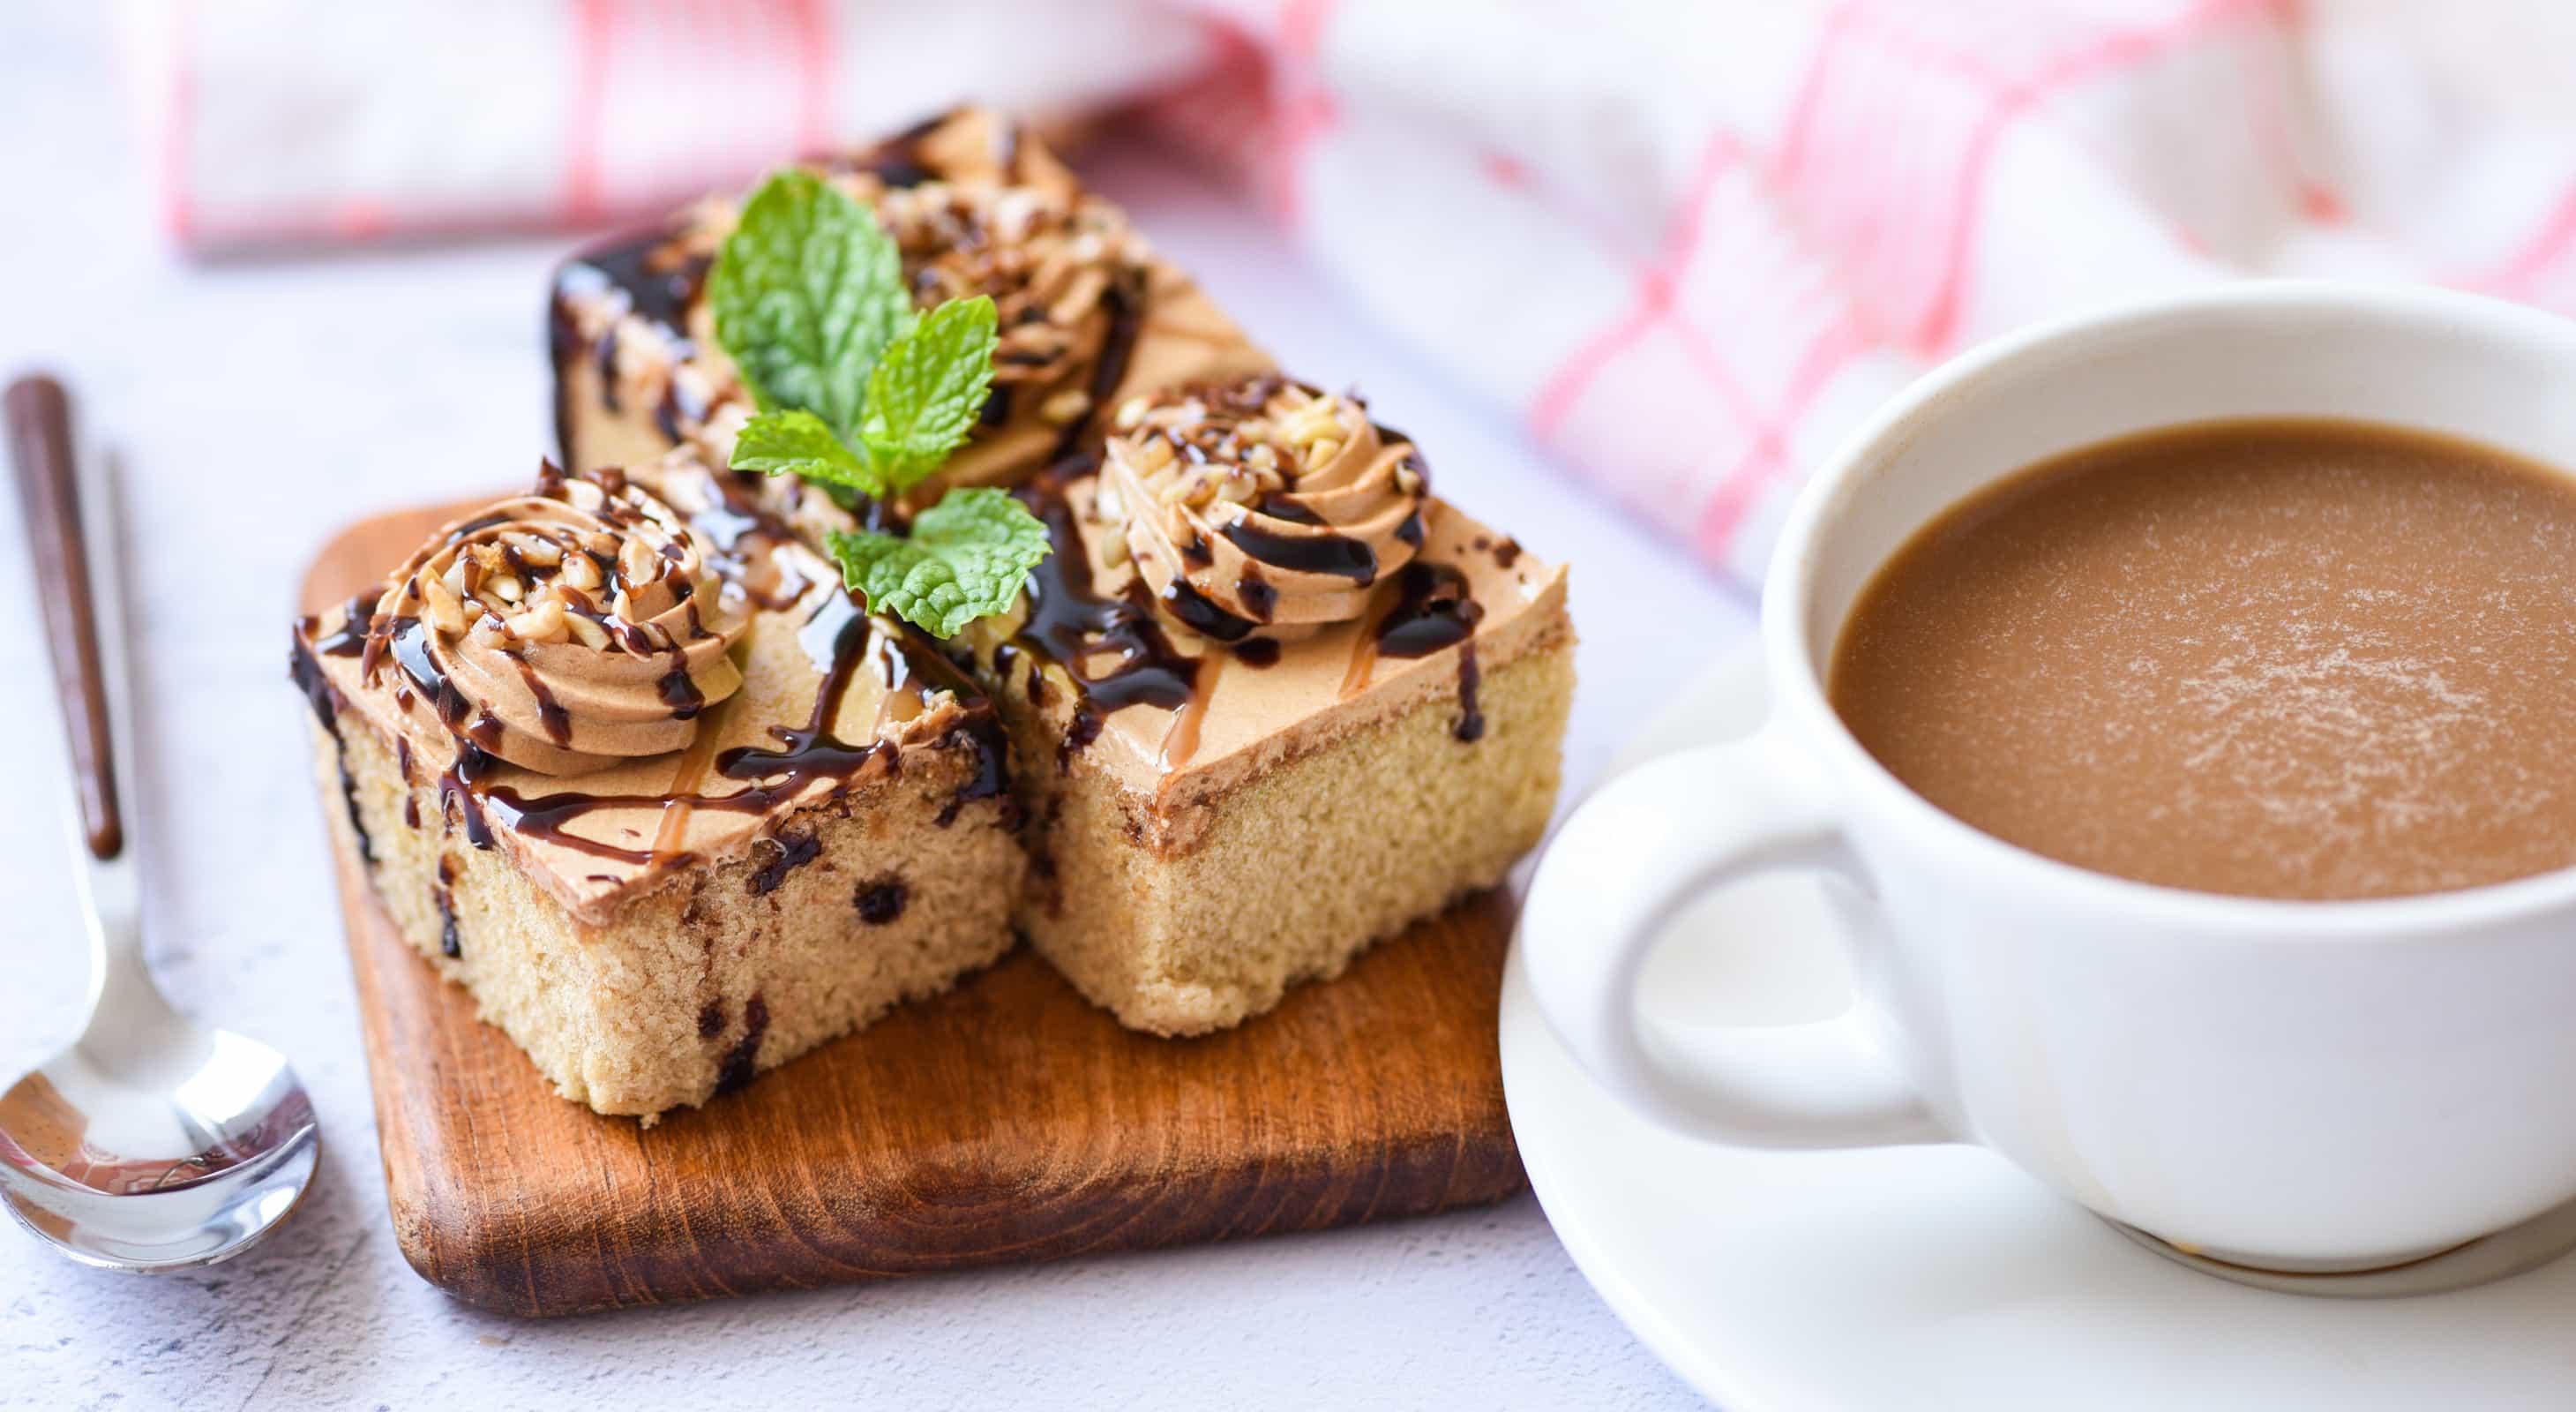 Coffee Cake served with coffee